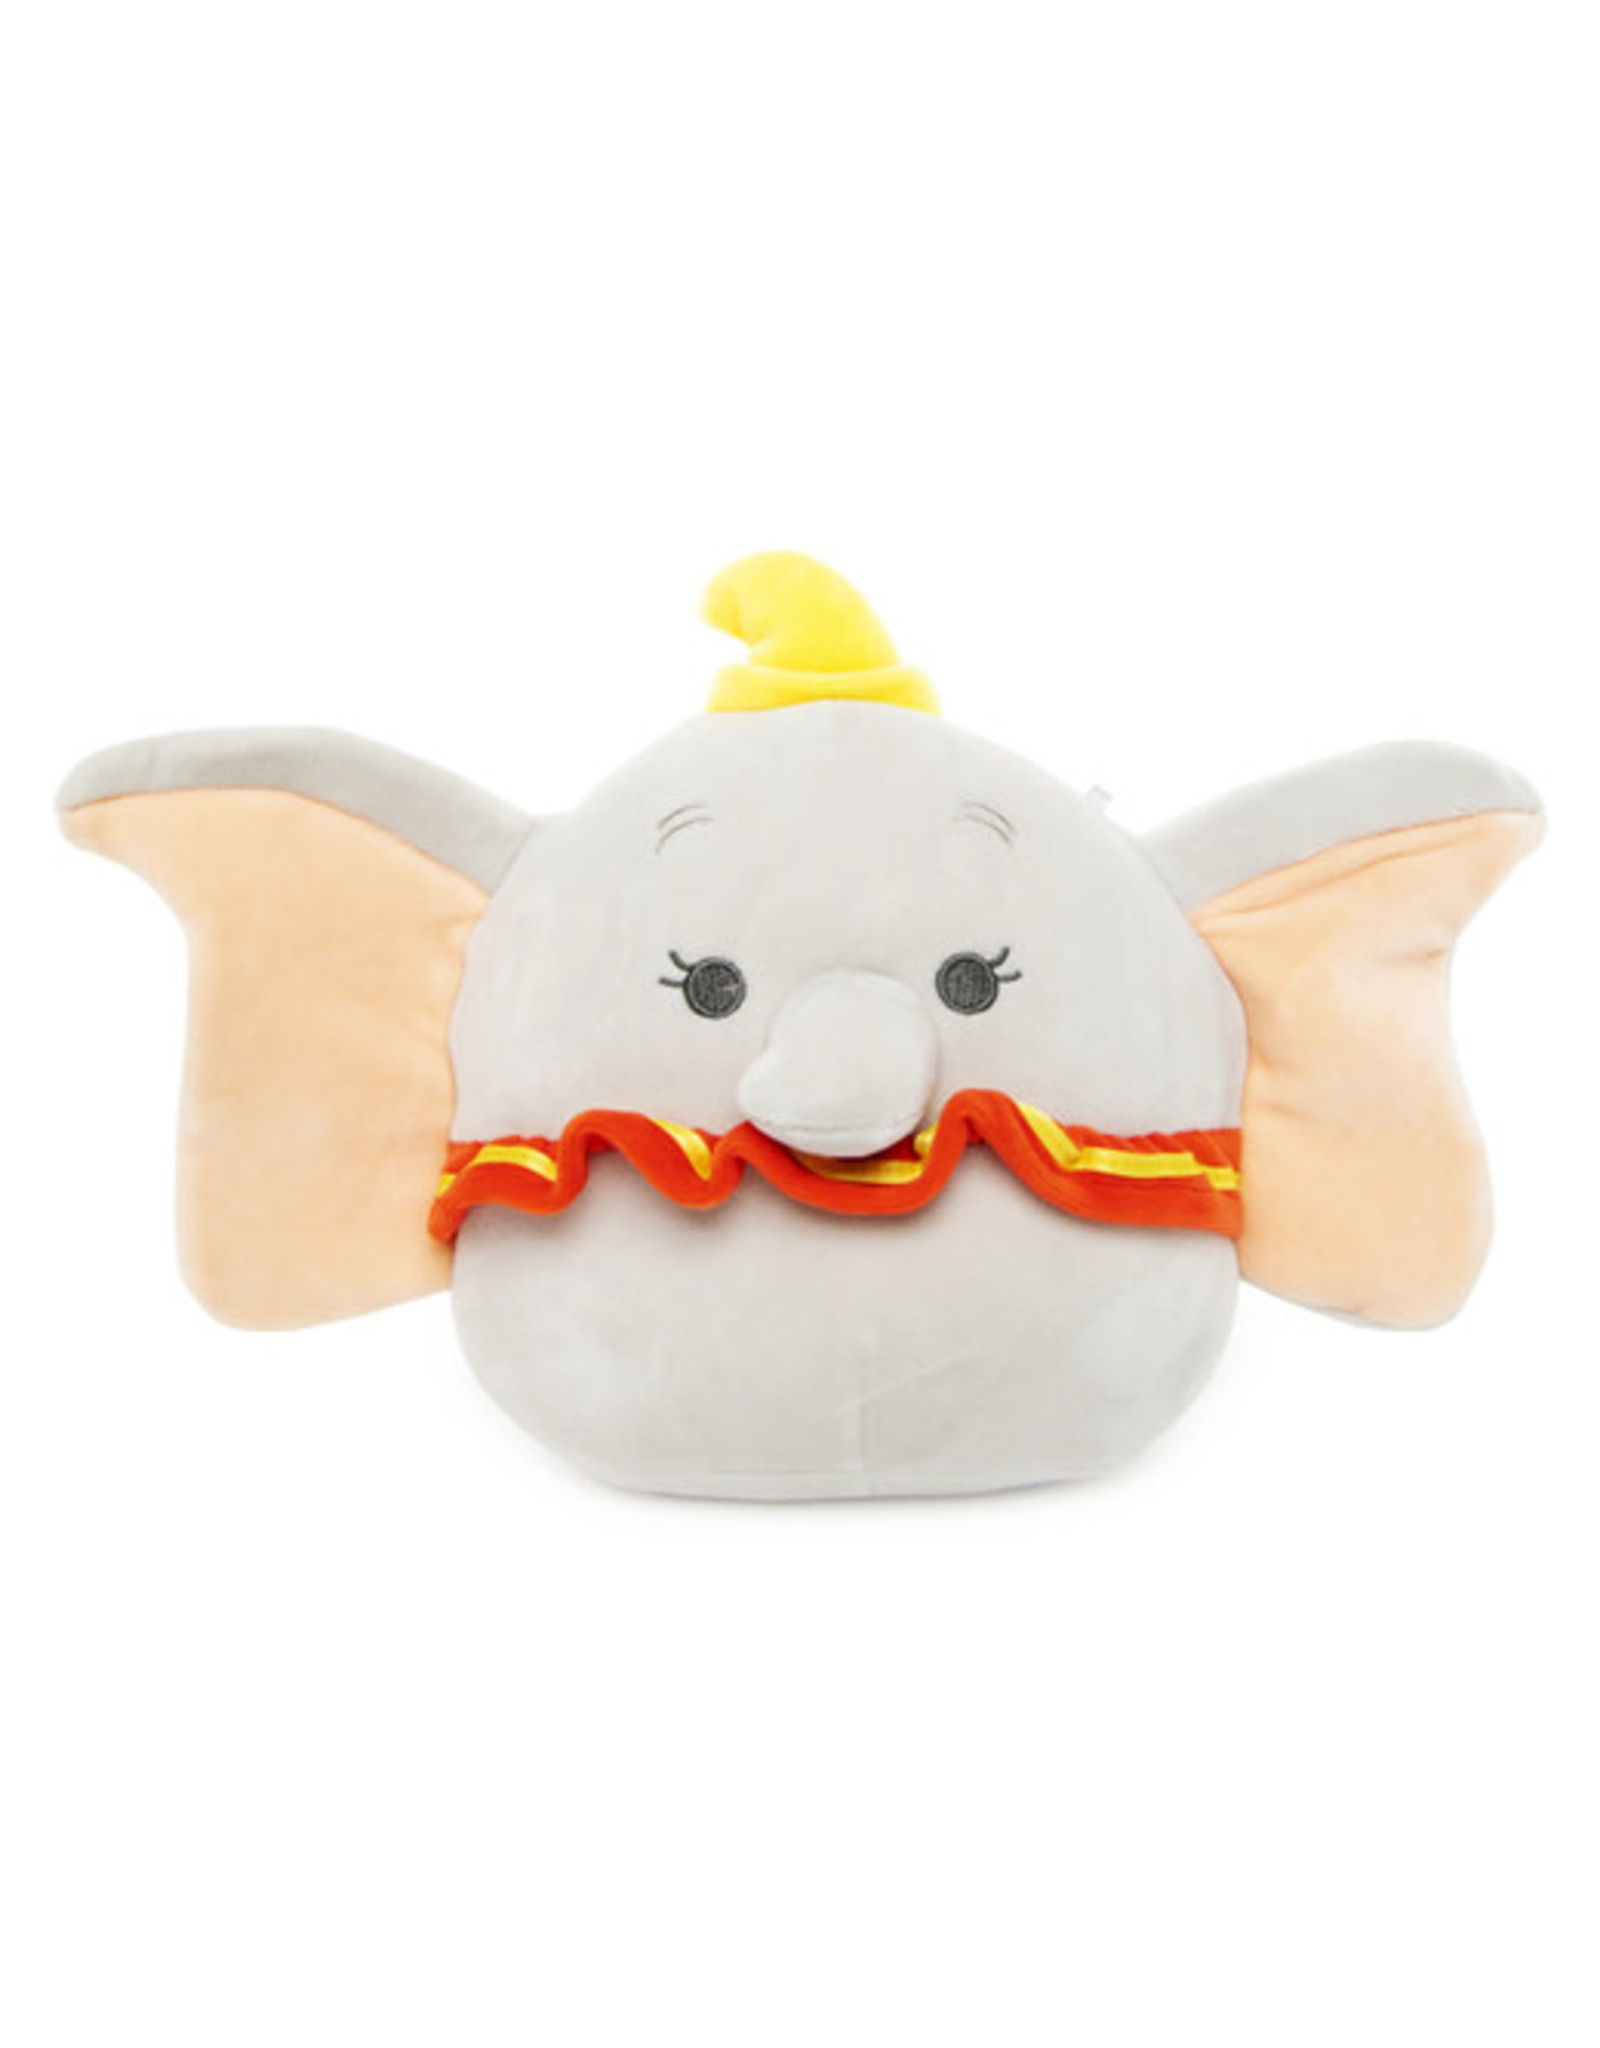 "Squishmallow Disney Squishmallow - Dumbo 12"""